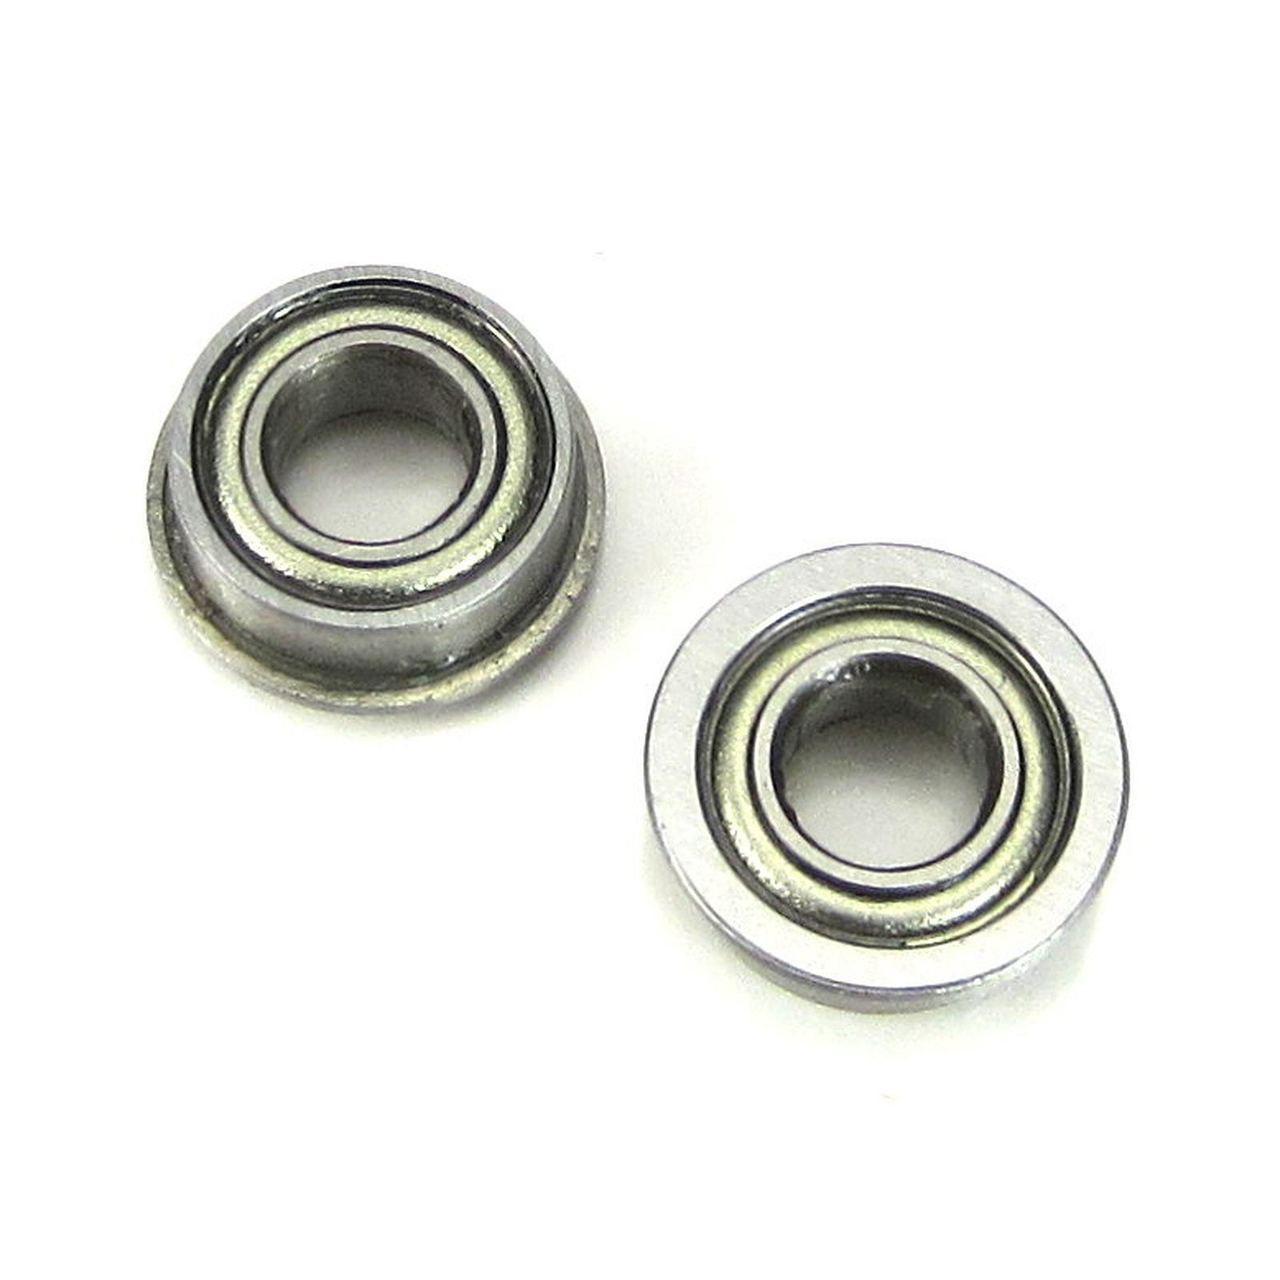 TRB RC 4x8x3mm Flanged Precision Ball Bearings Metal Shields (2)